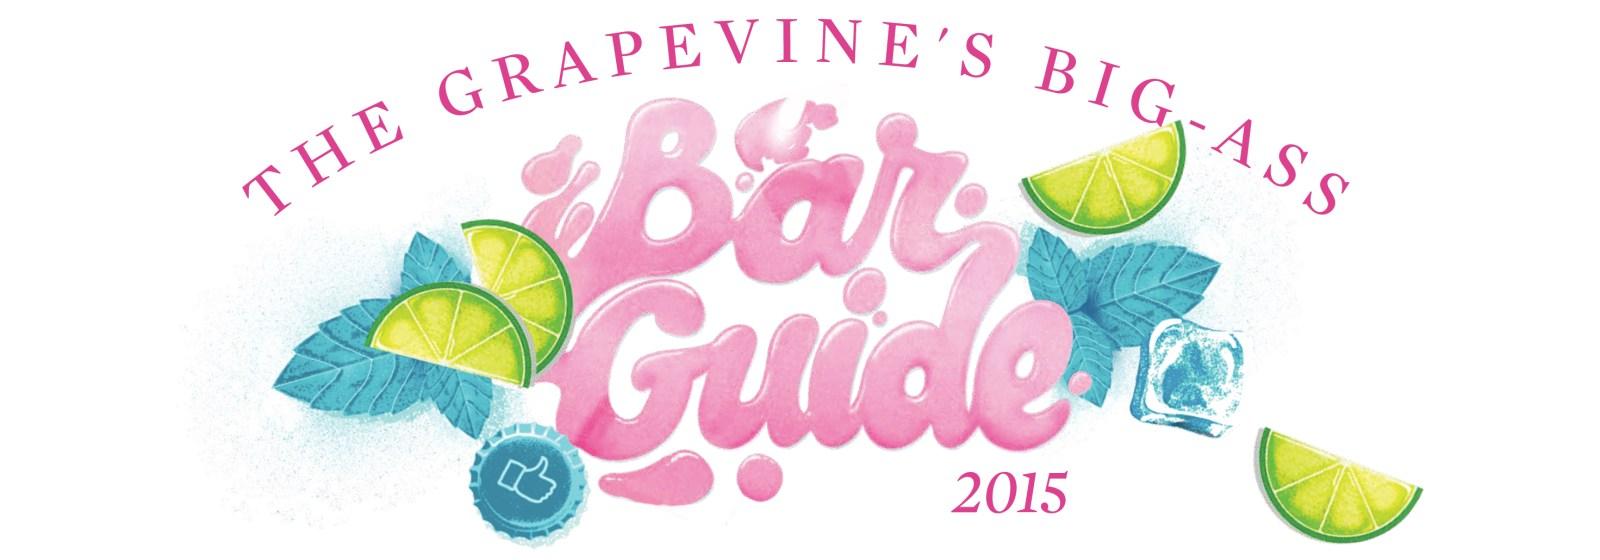 THE GRAPEVINE'S BIG-ASS BAR GUIDE 2015!